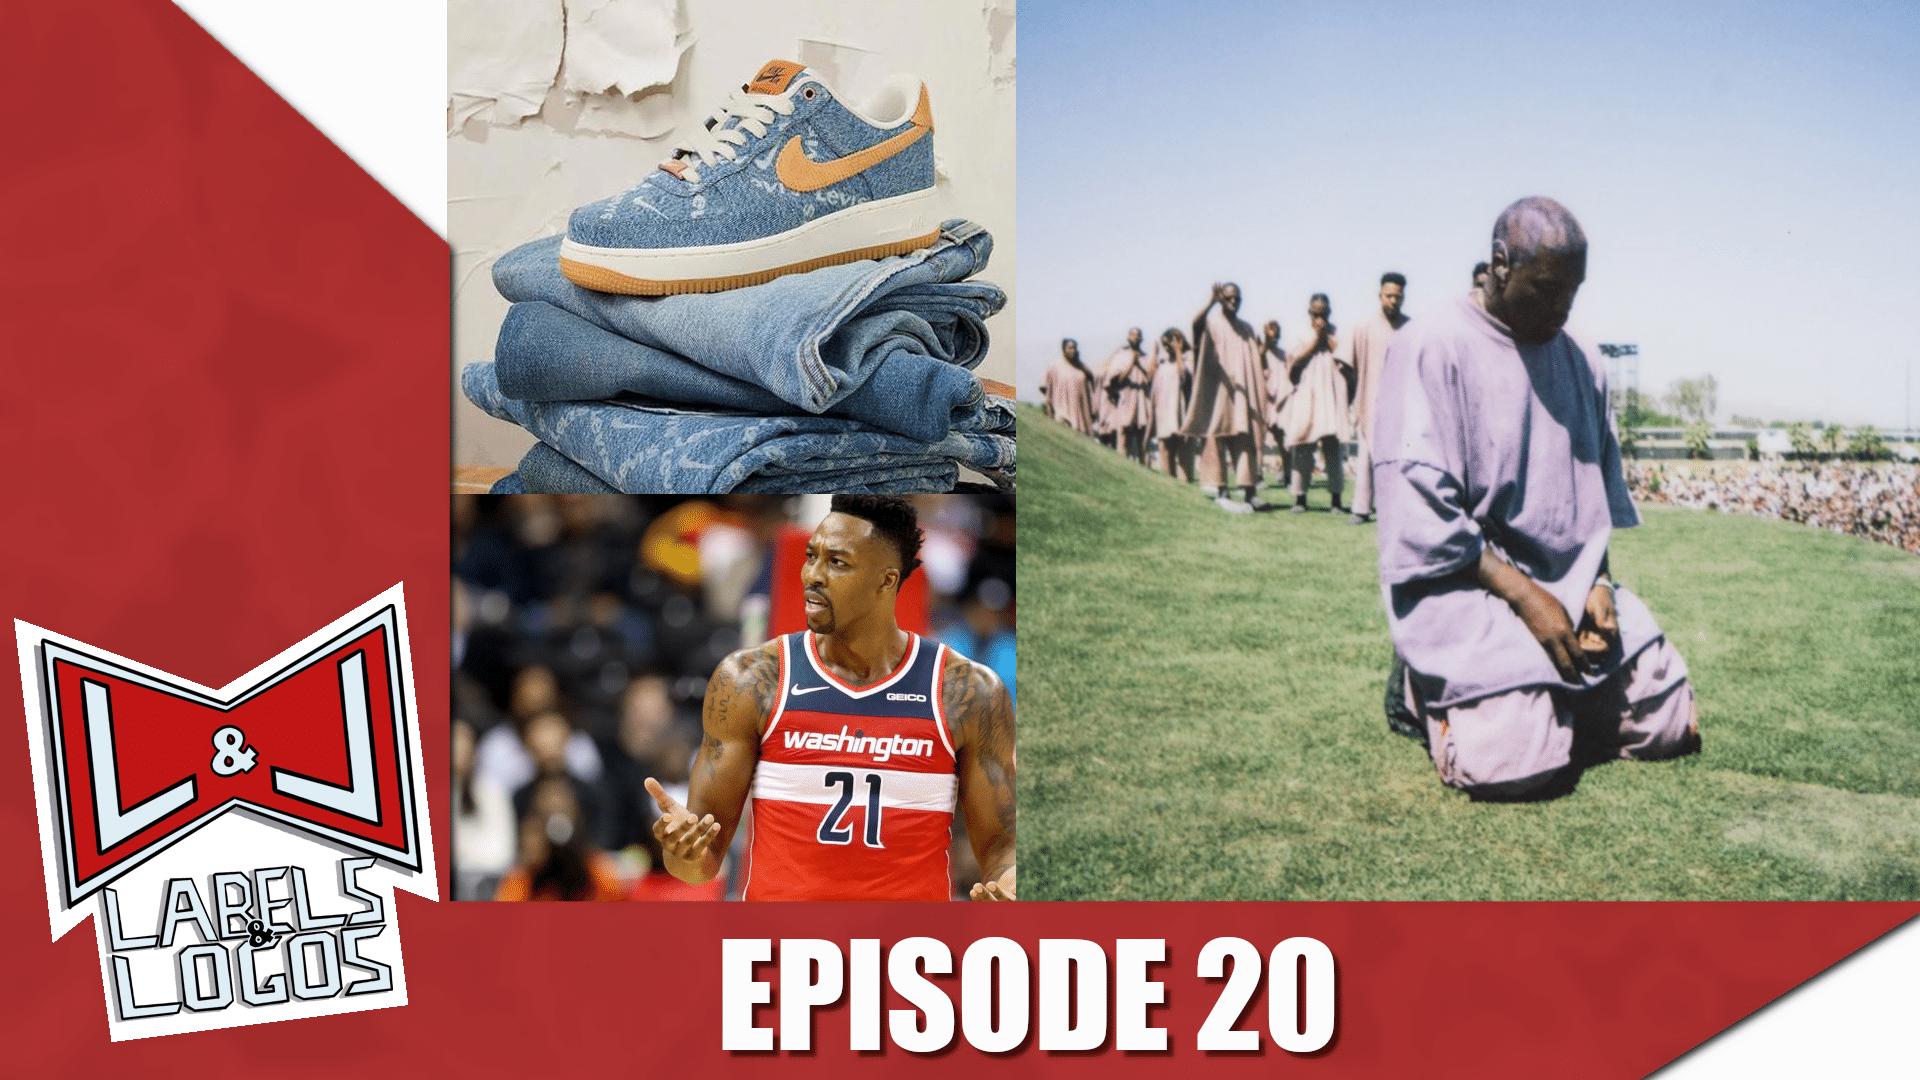 Labels & Logos - Episode 20 - Complex Con